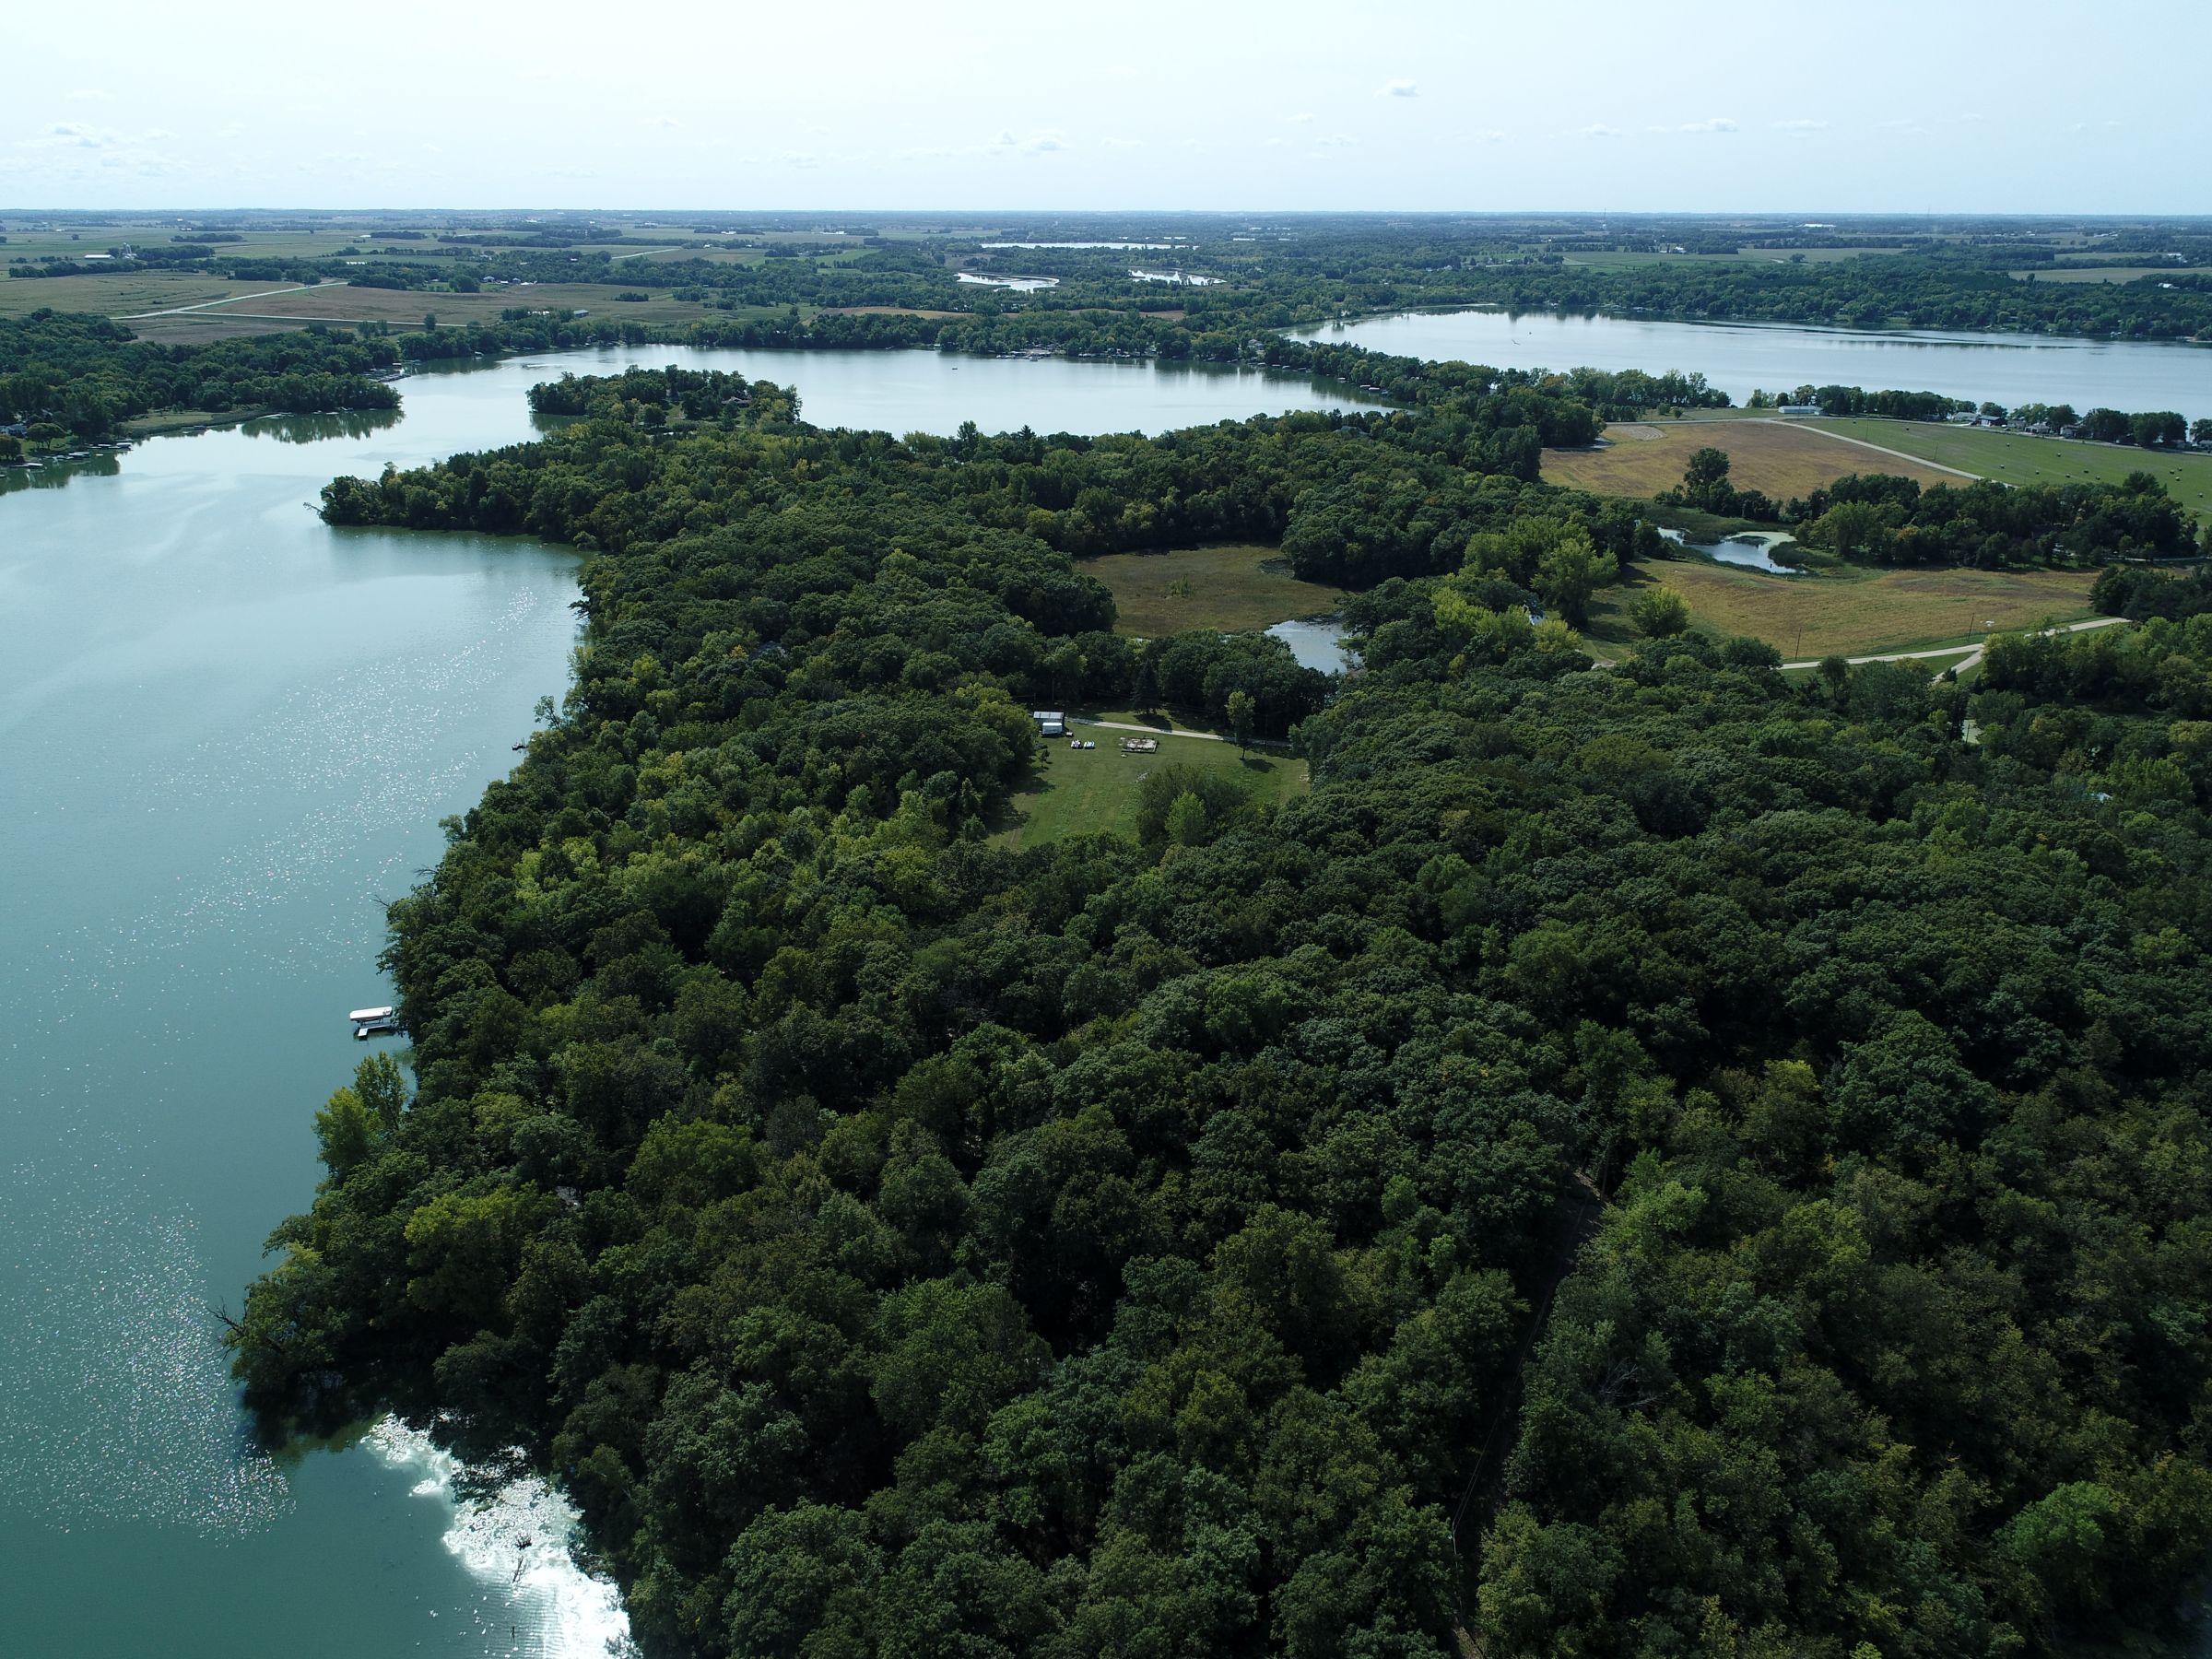 residential-development-land-0-acres-listing-number-15781-0-2021-09-28-020008.JPG